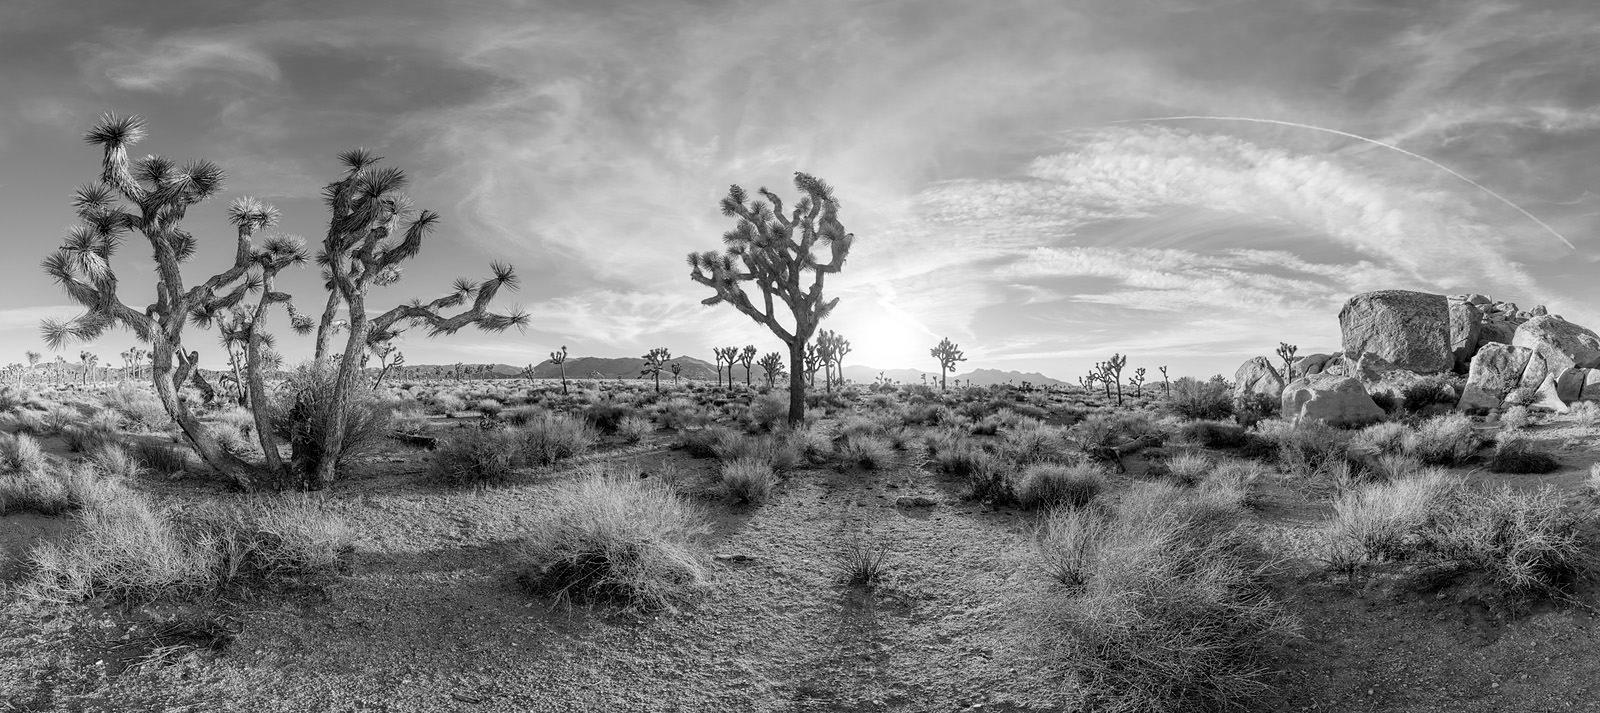 Joshua Tree Acrylic - California Black & White Fine Art Photo